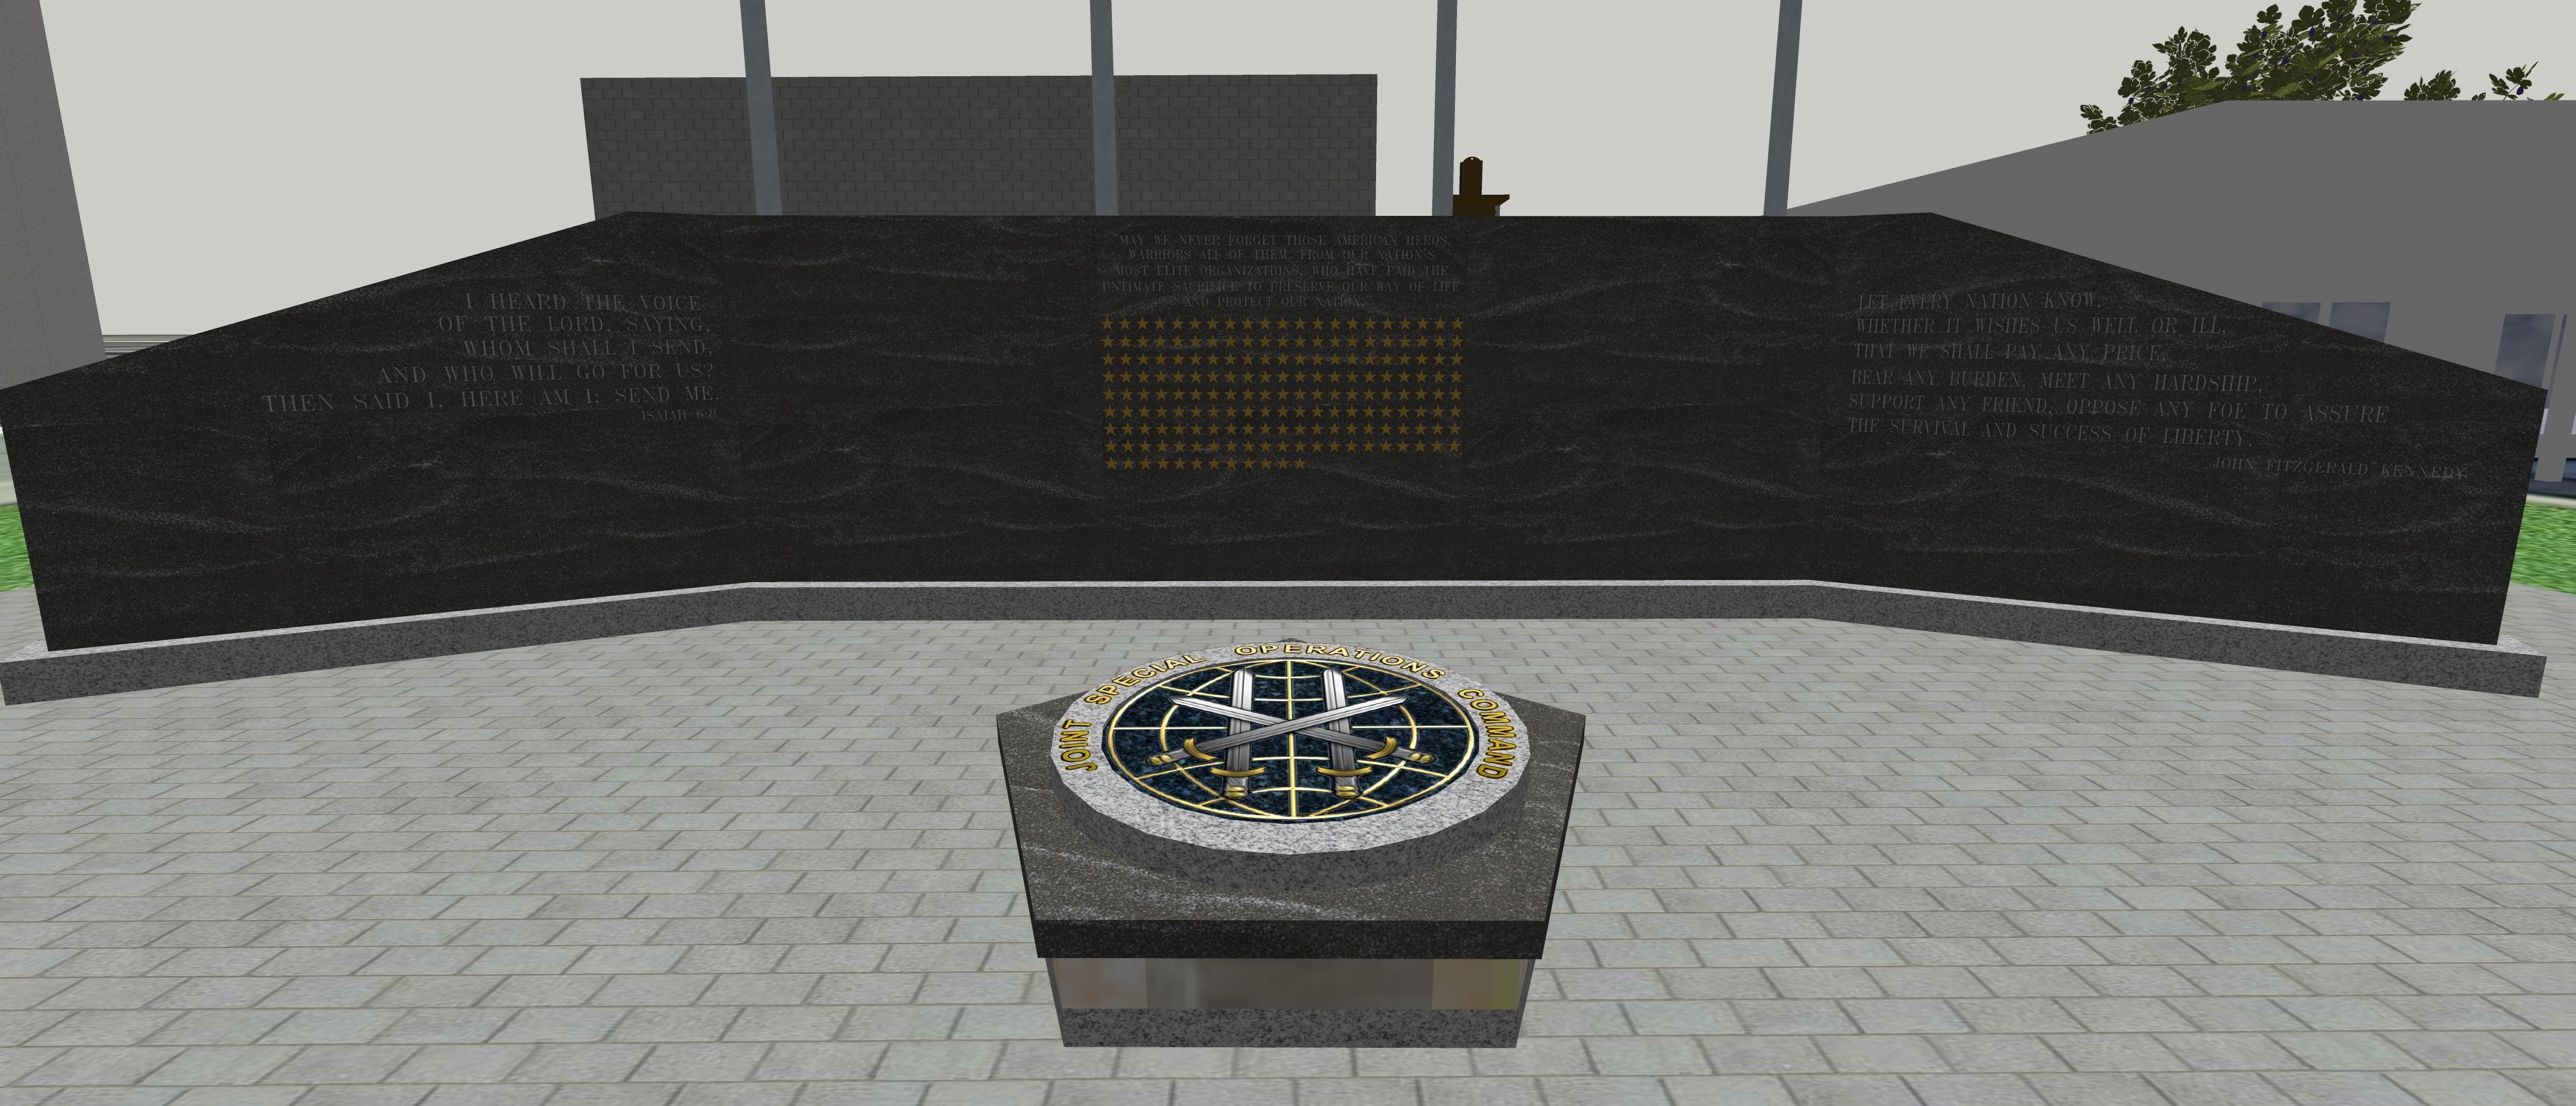 Memorial Wall Concept Art